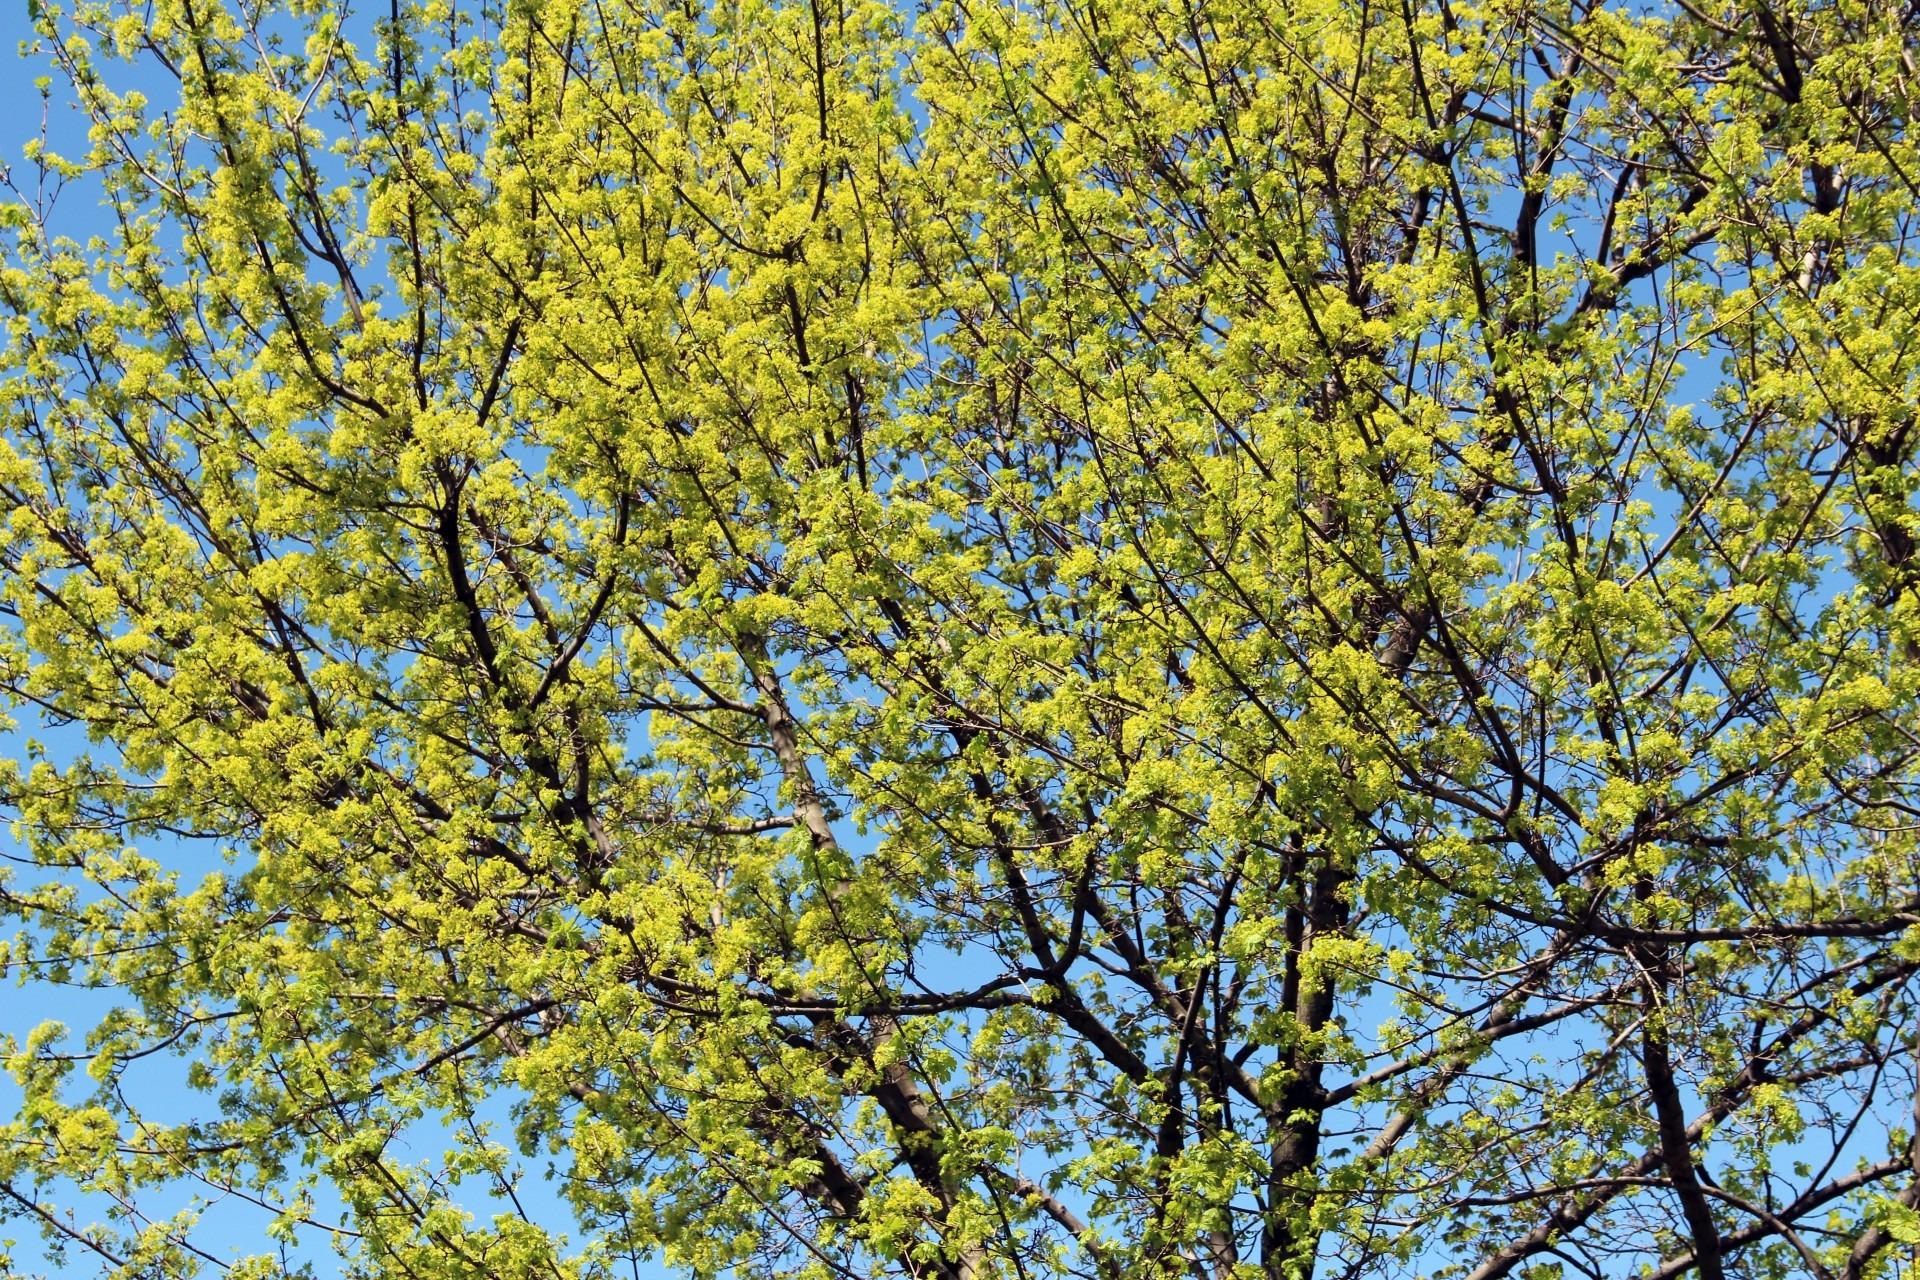 Fotos gratis : bosque, rama, flor, hoja, florecer, primavera ...